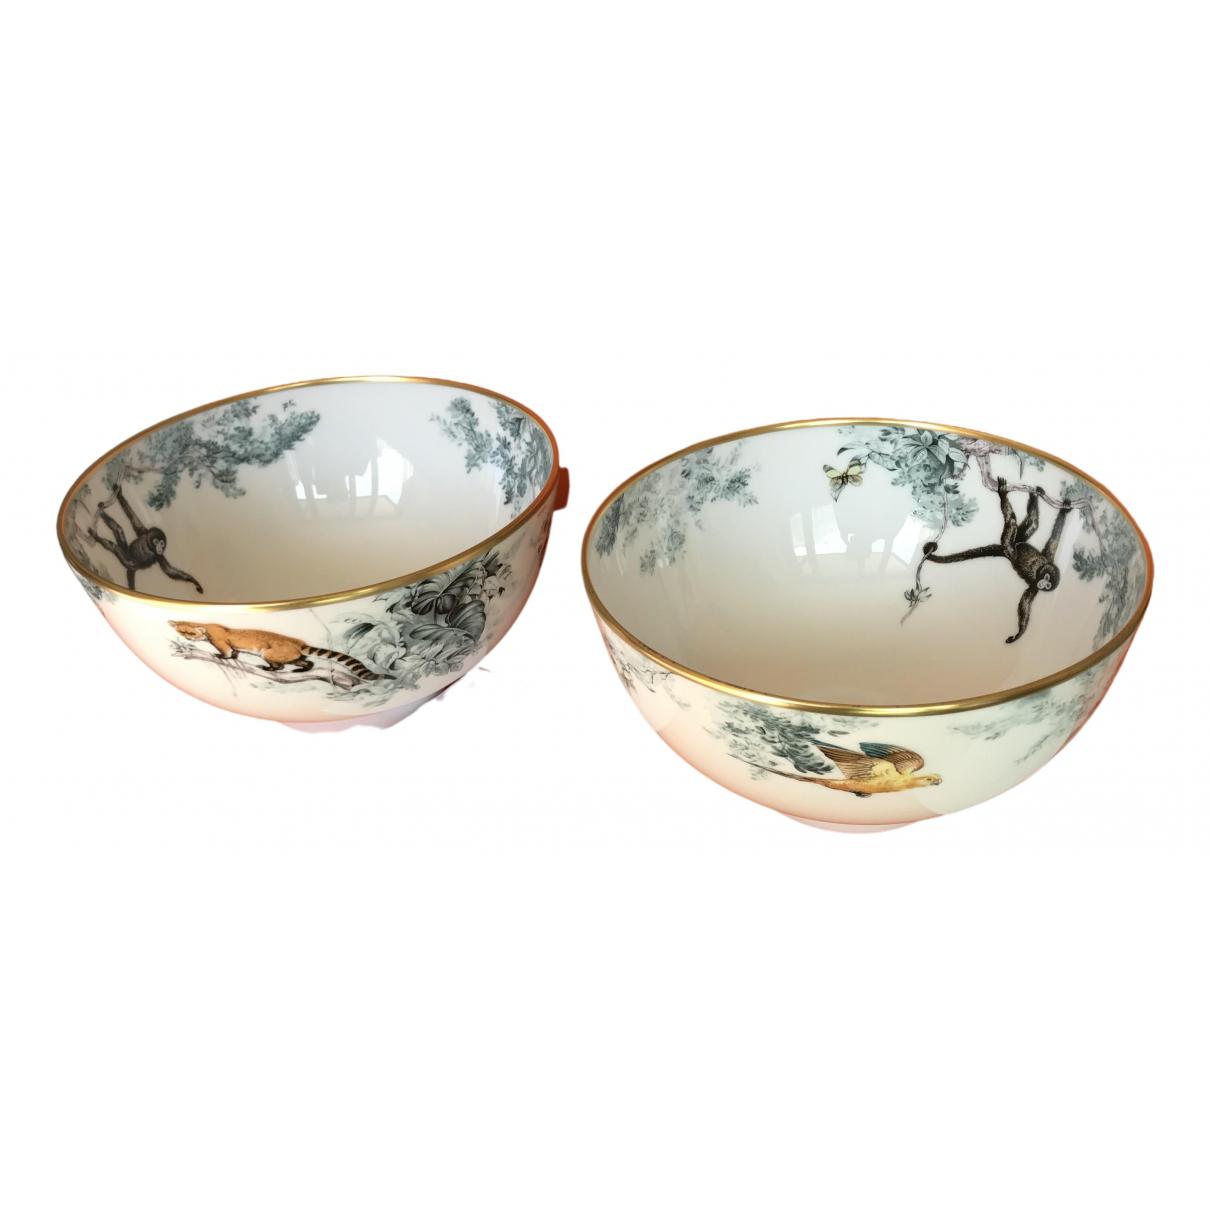 Hermès Carnets d'Équateur White Porcelain Dinnerware for Life & Living \N